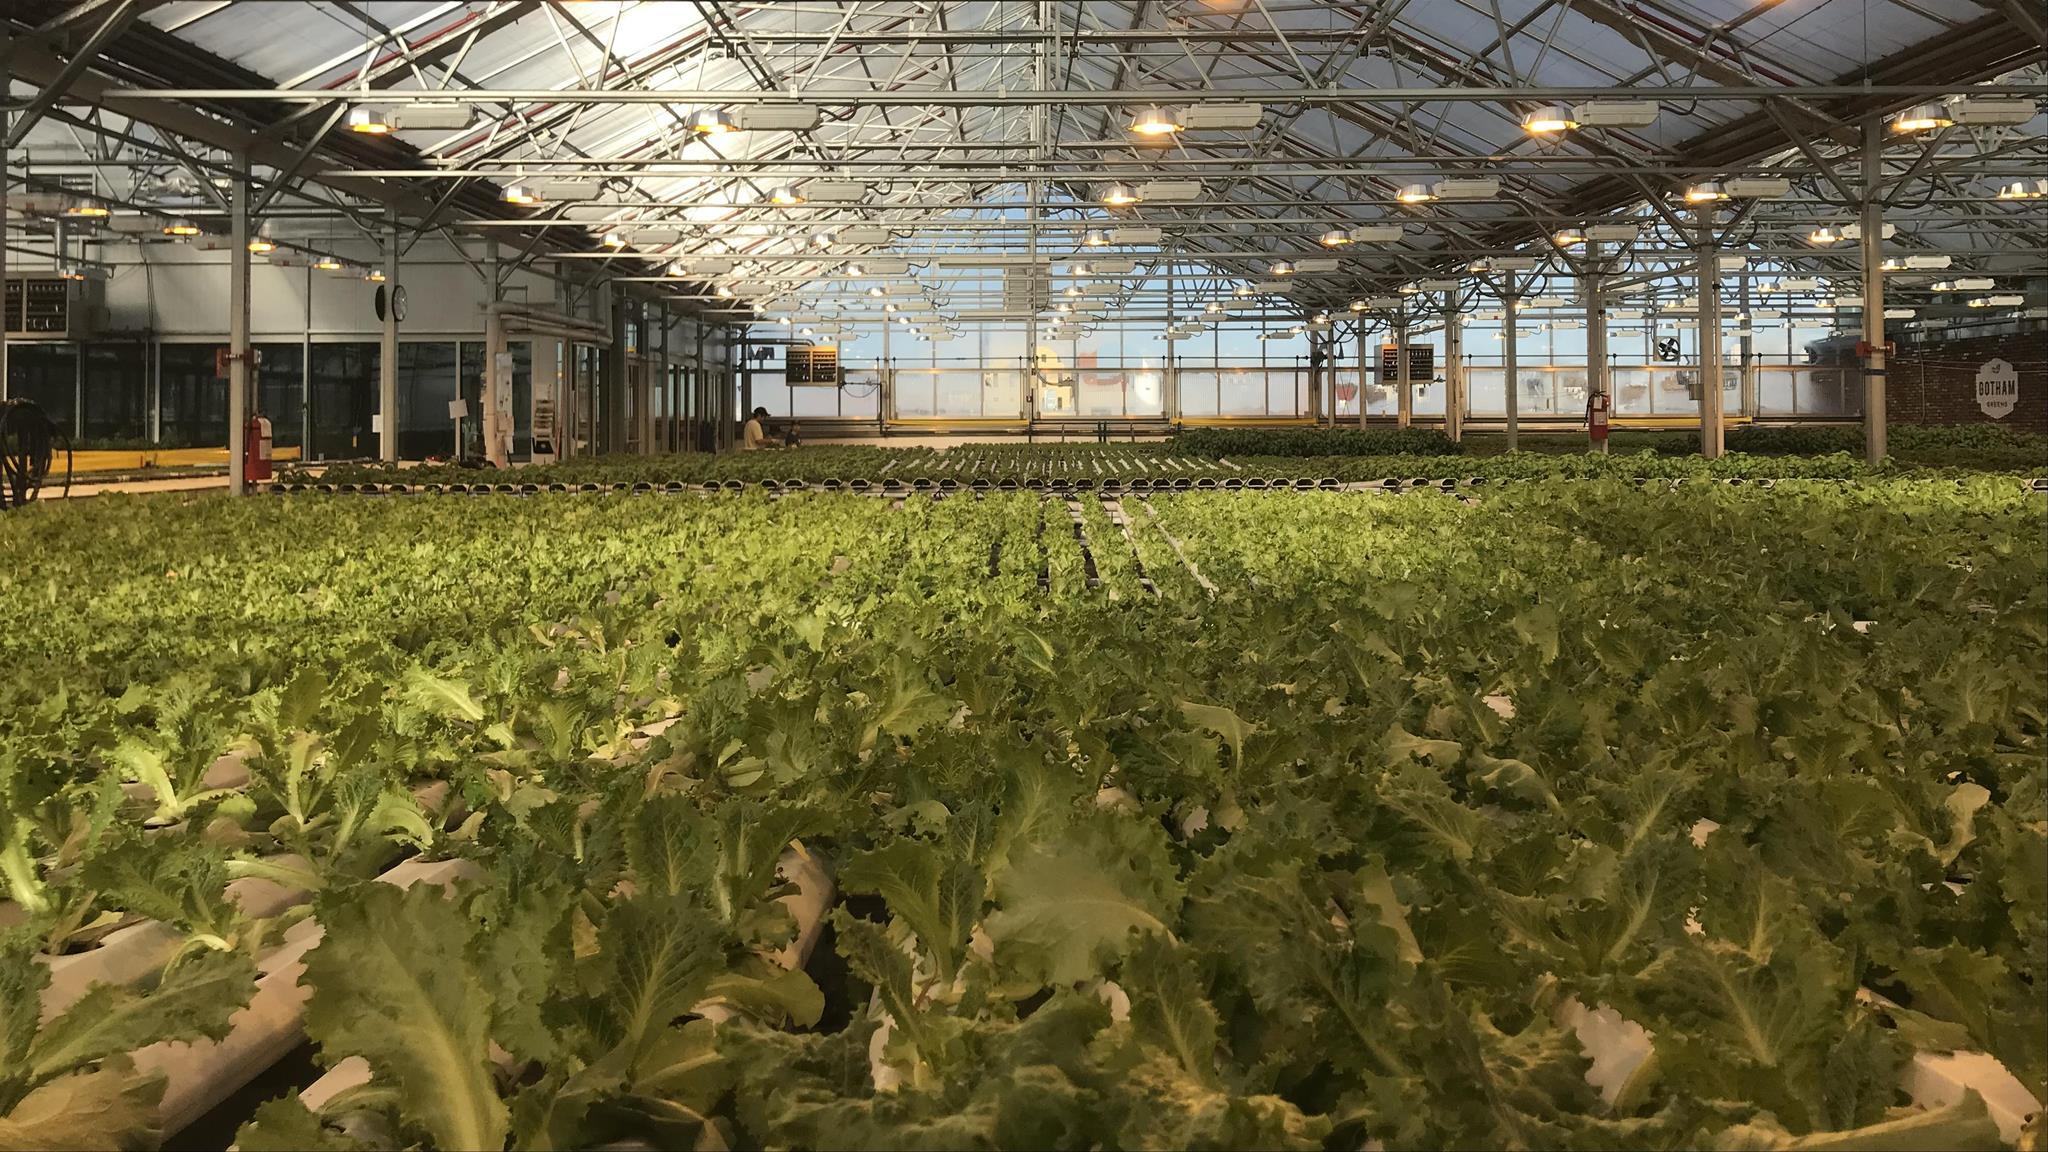 120375_Lettuce-fields-on-Gotham-Green-growth-floor.jpg